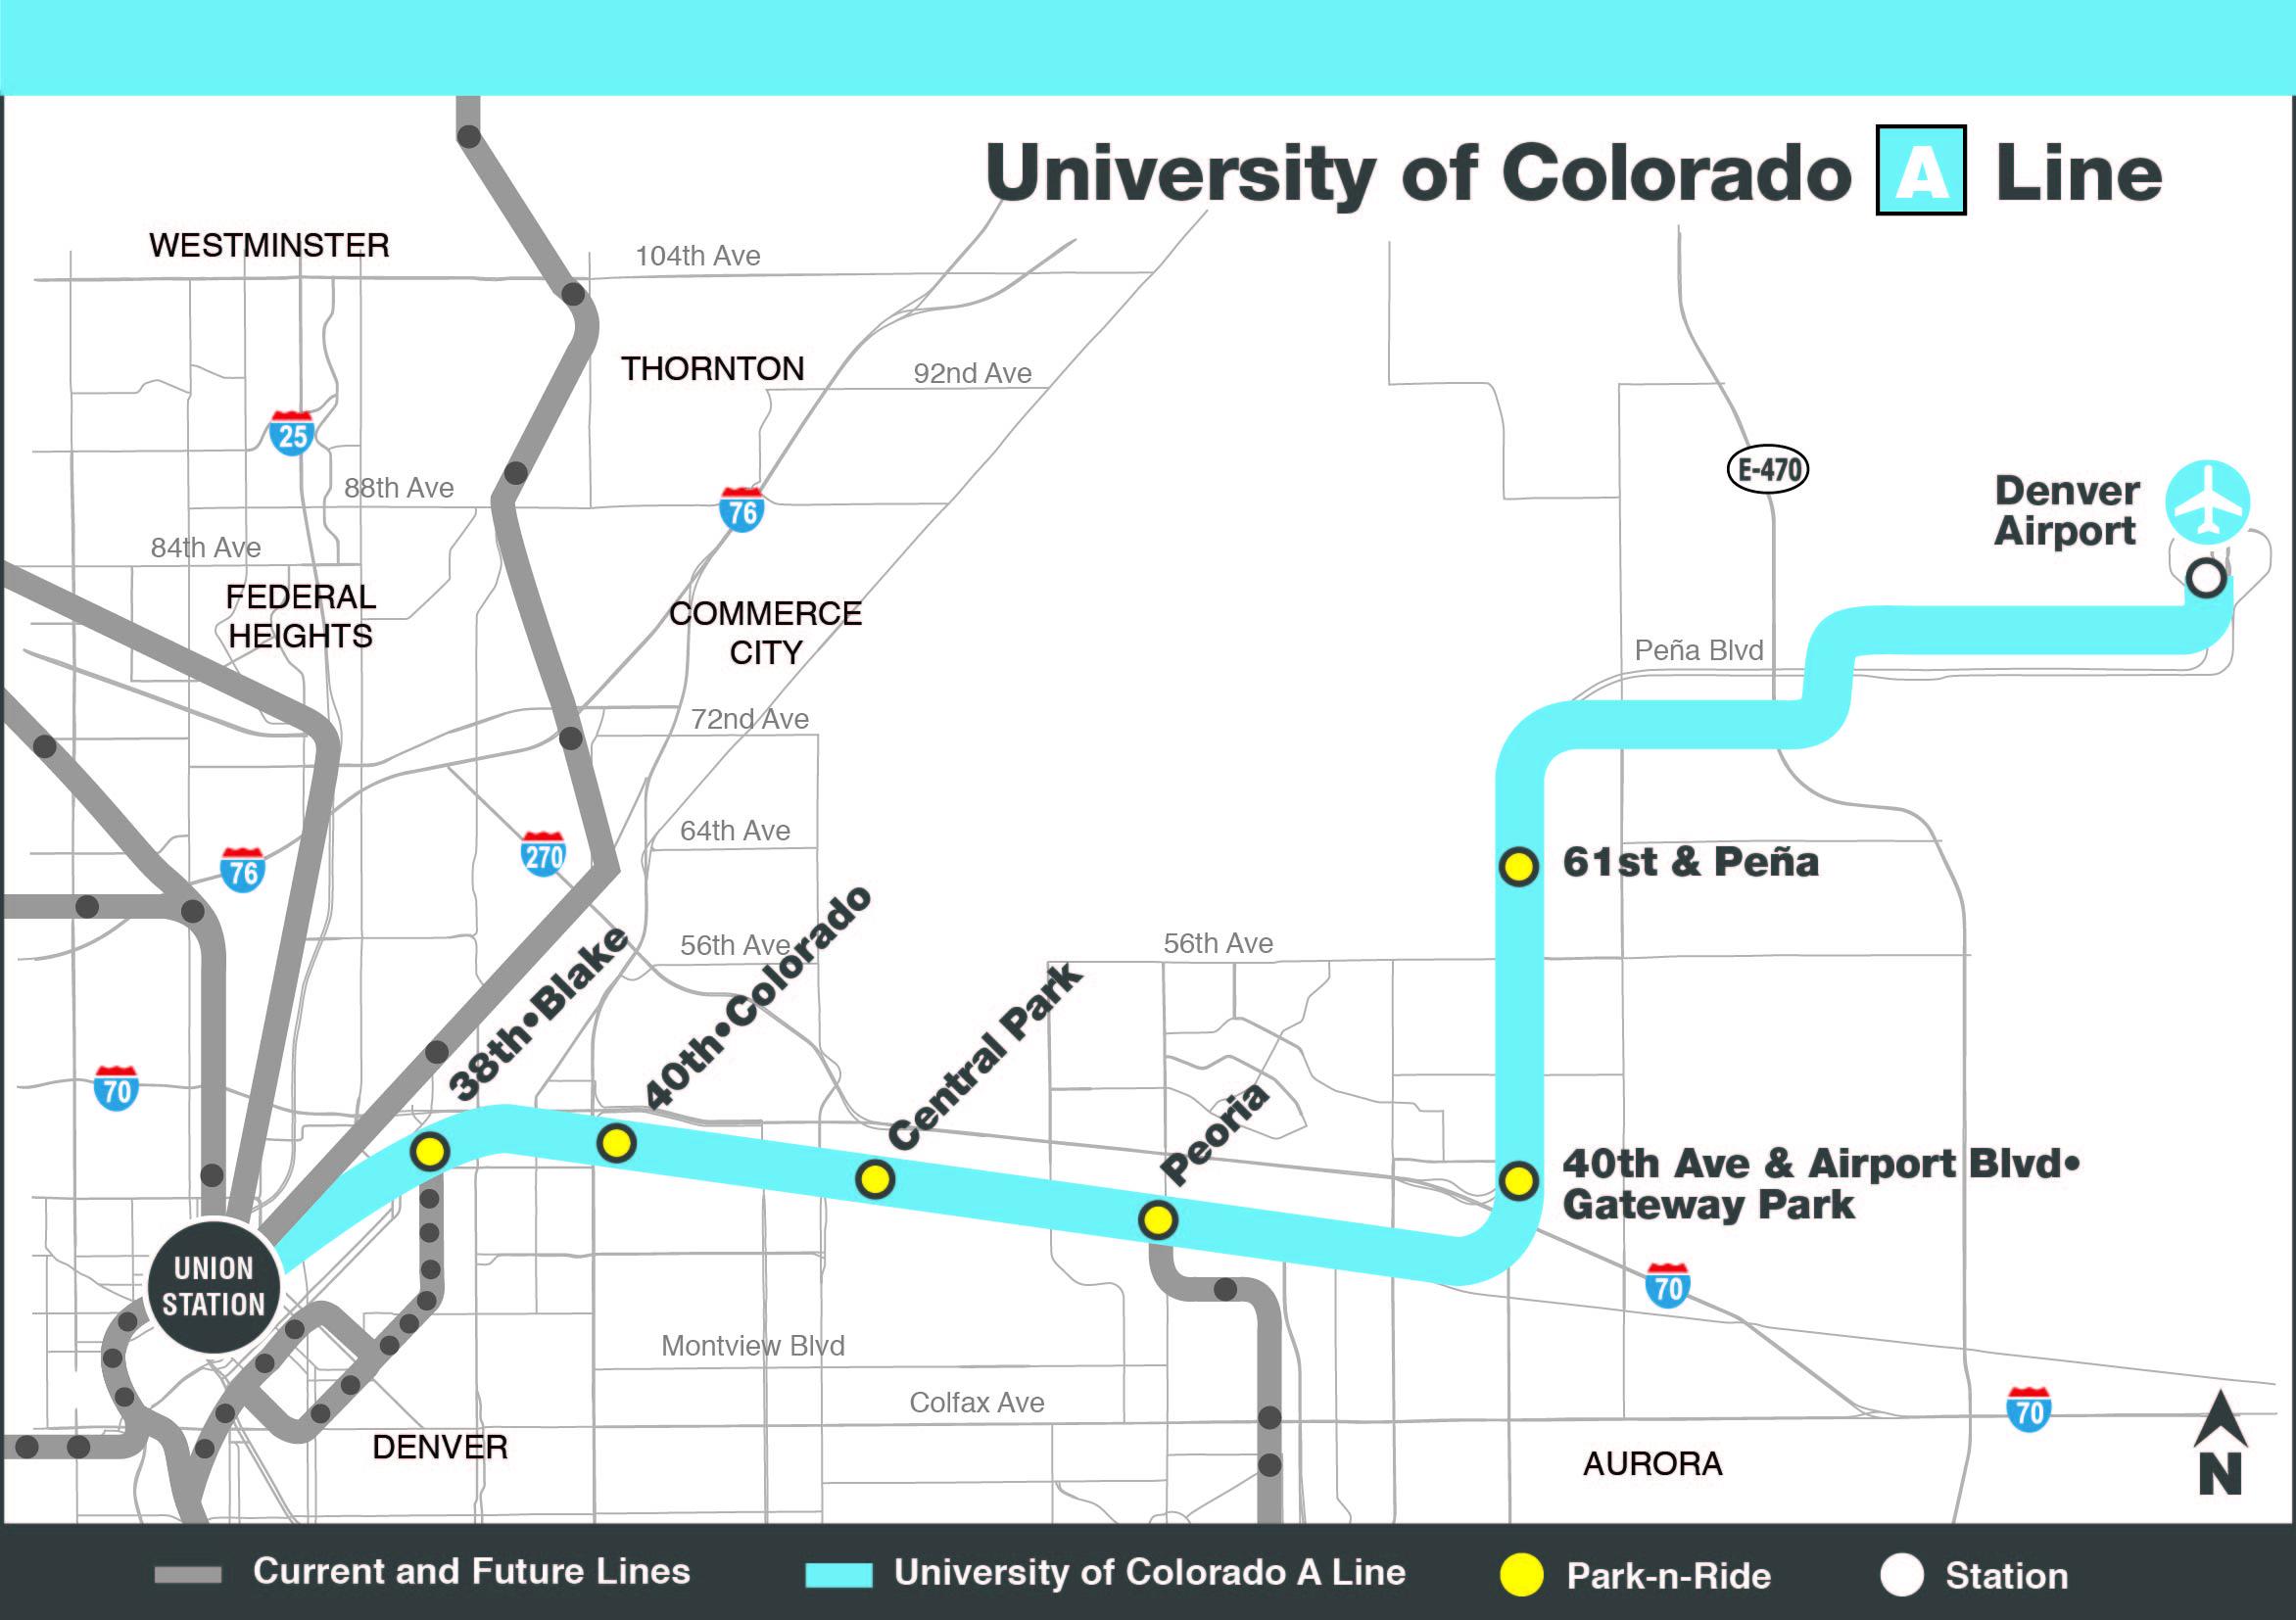 University of Colorado A Line Map